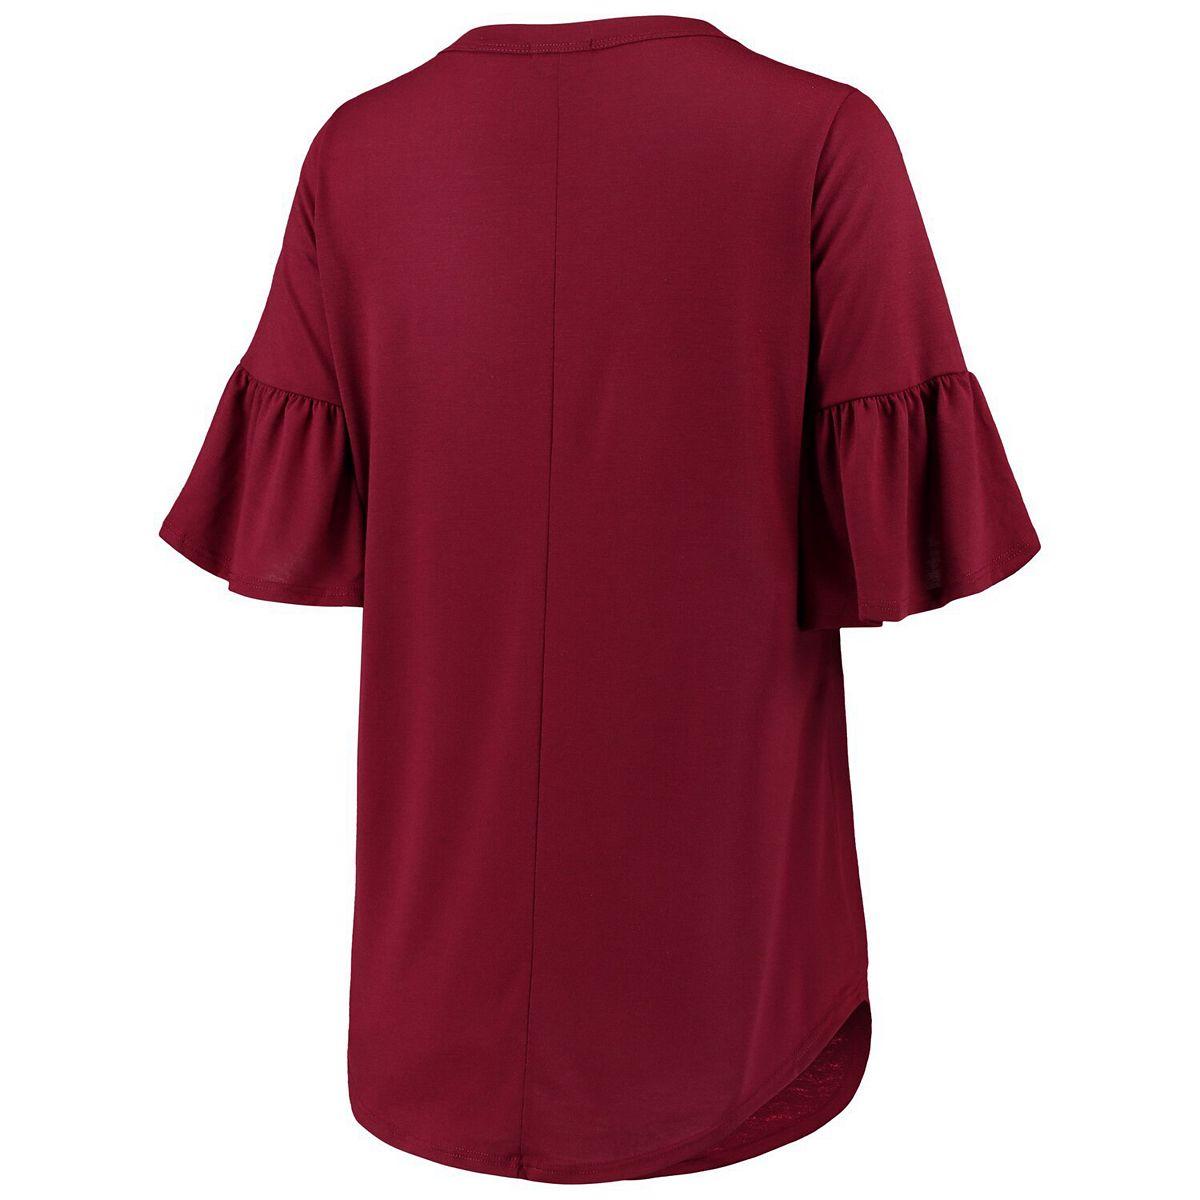 Women's Garnet Florida State Seminoles Ruffle And Ready Keyhole Tri-Blend 3/4-Sleeve T-Shirt H9yot